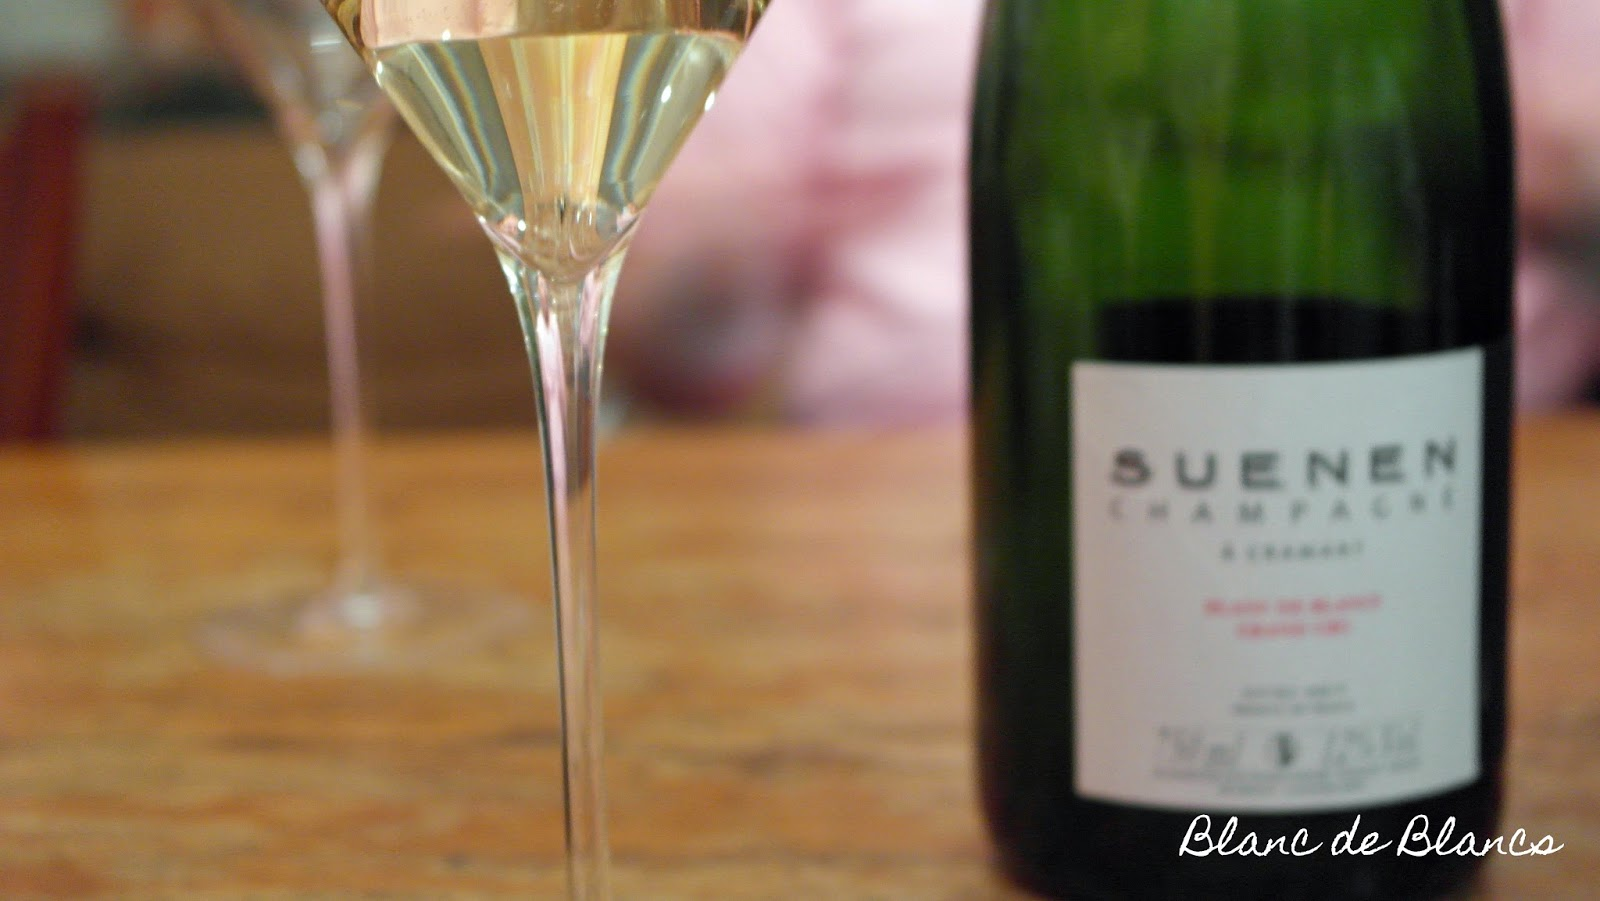 Suenen Champagne  - www.blancdeblancs.fi